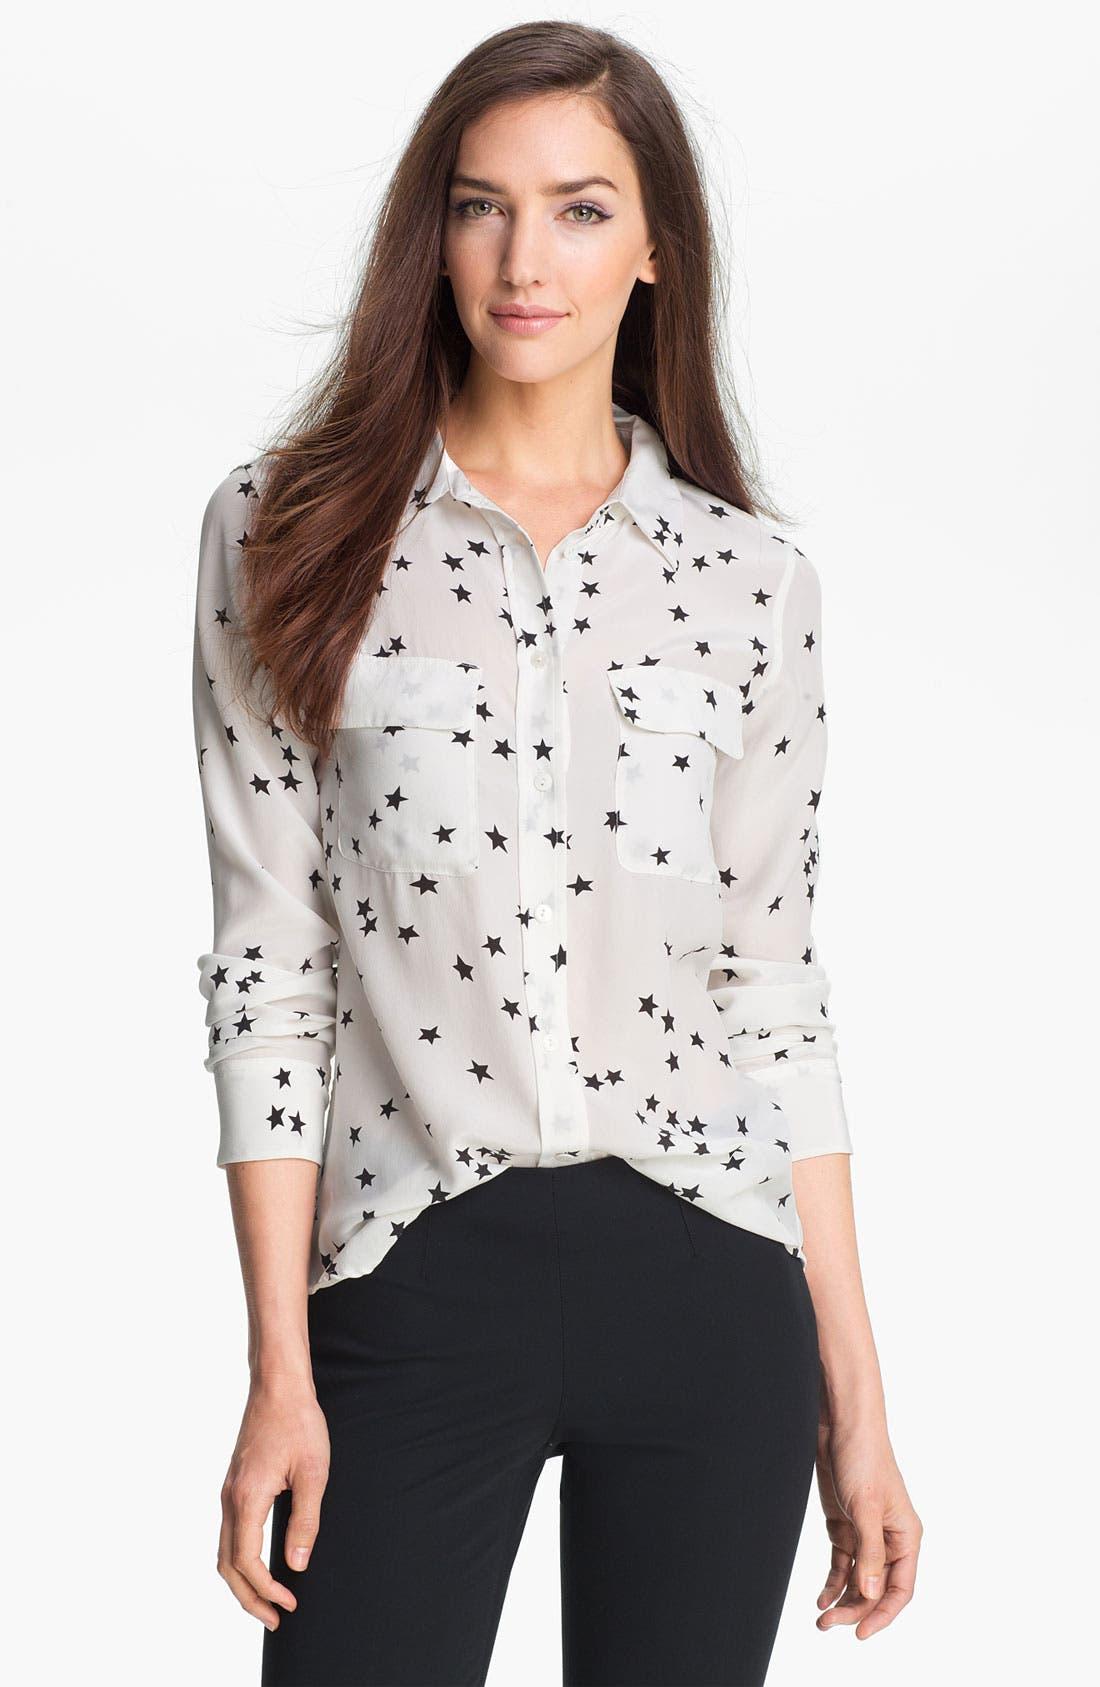 'Starry Night' Silk Shirt,                             Main thumbnail 1, color,                             BRIGHT WHITE/ BLACK